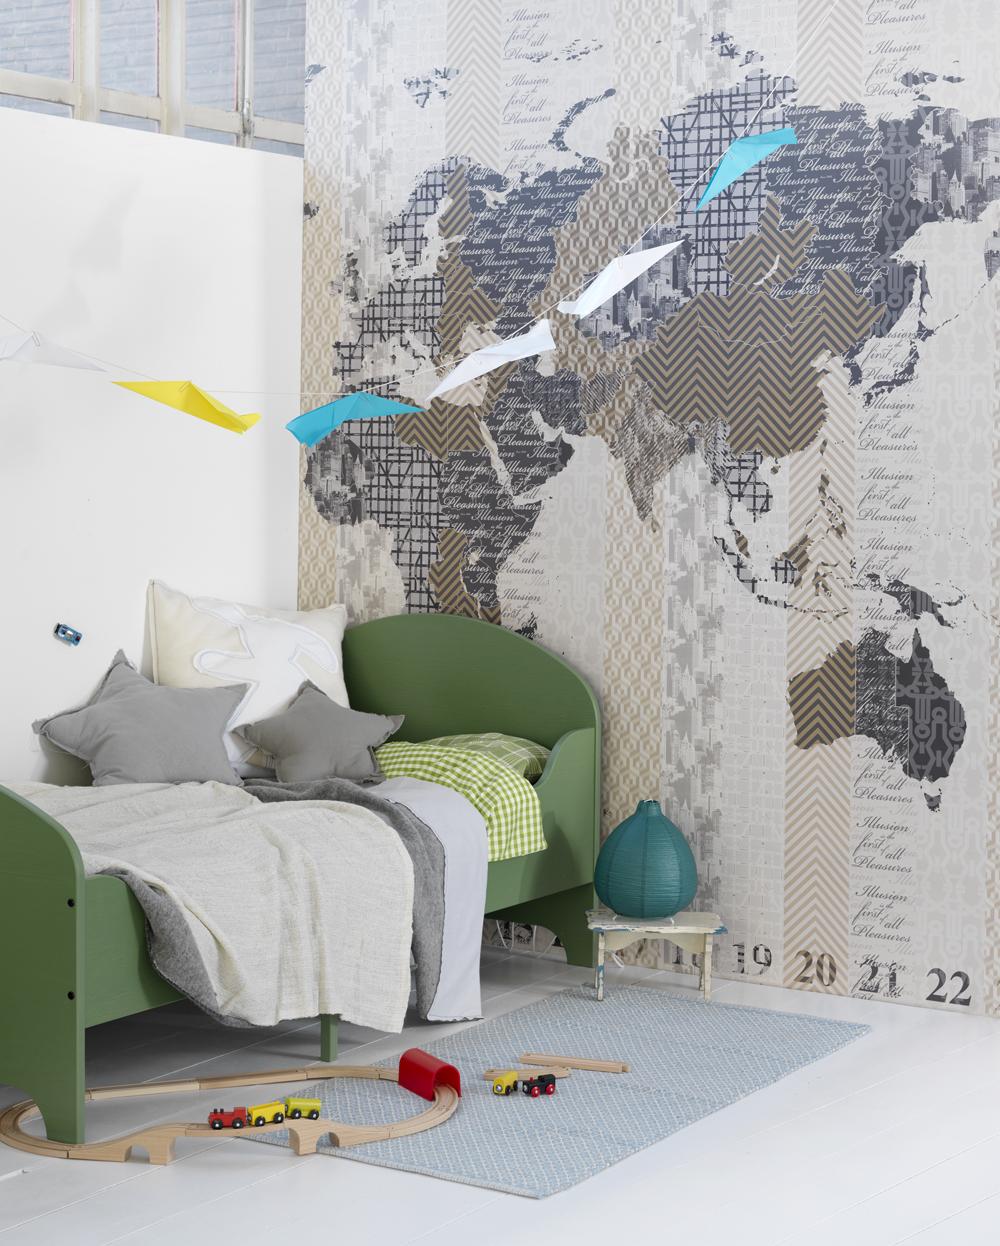 Kinderkamer interieurideeën   inspiraties   showhome.nl